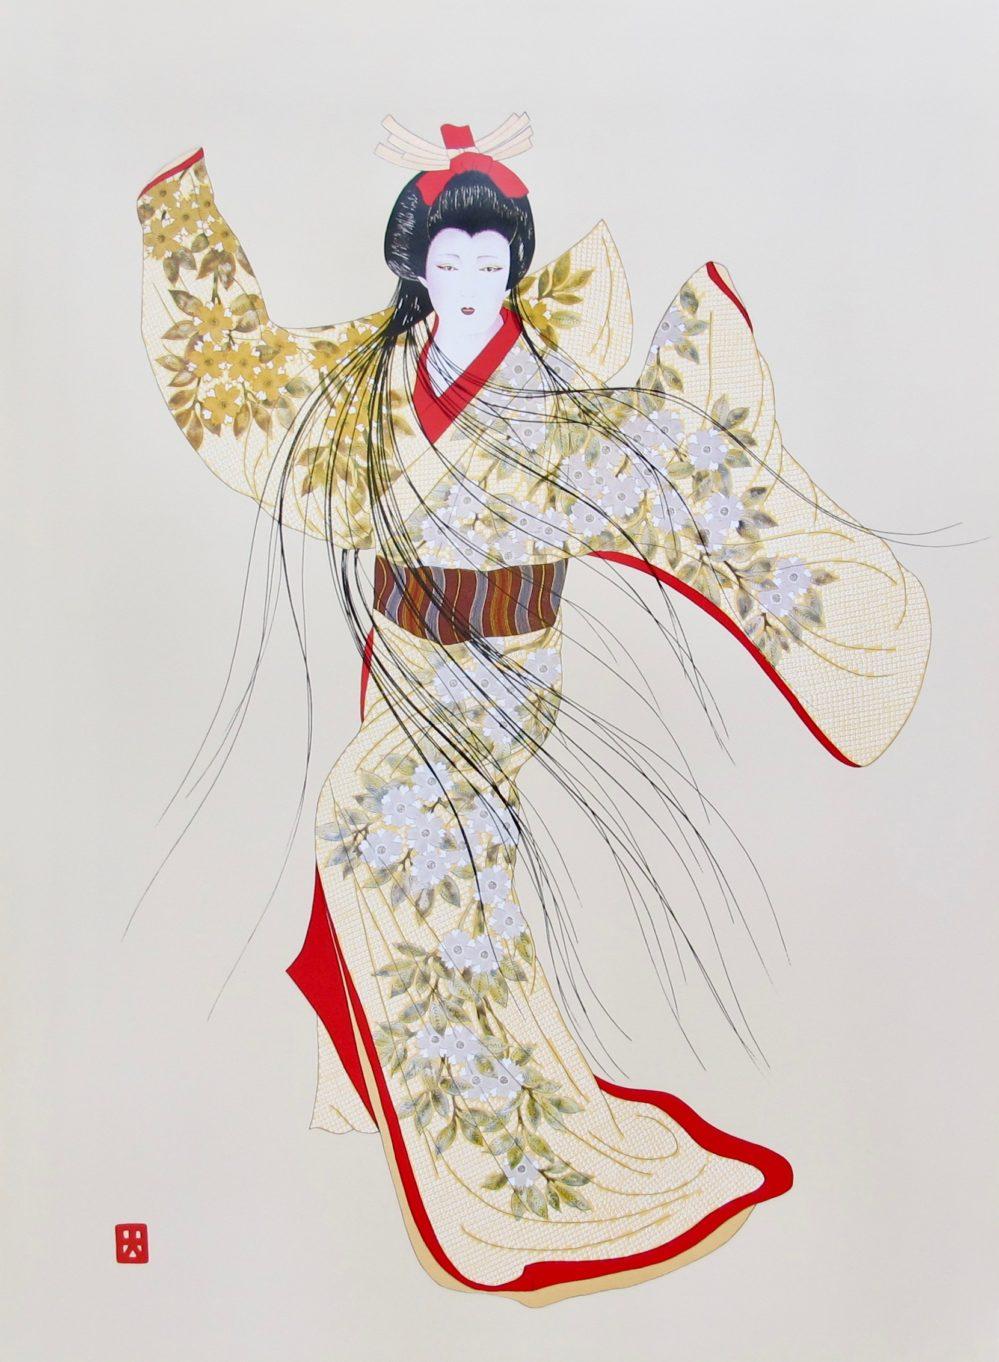 Hisashi Otsuka VISION OF ELEGANCE 1992 Plate Signed Art Pearl Silk & Gold Leaf